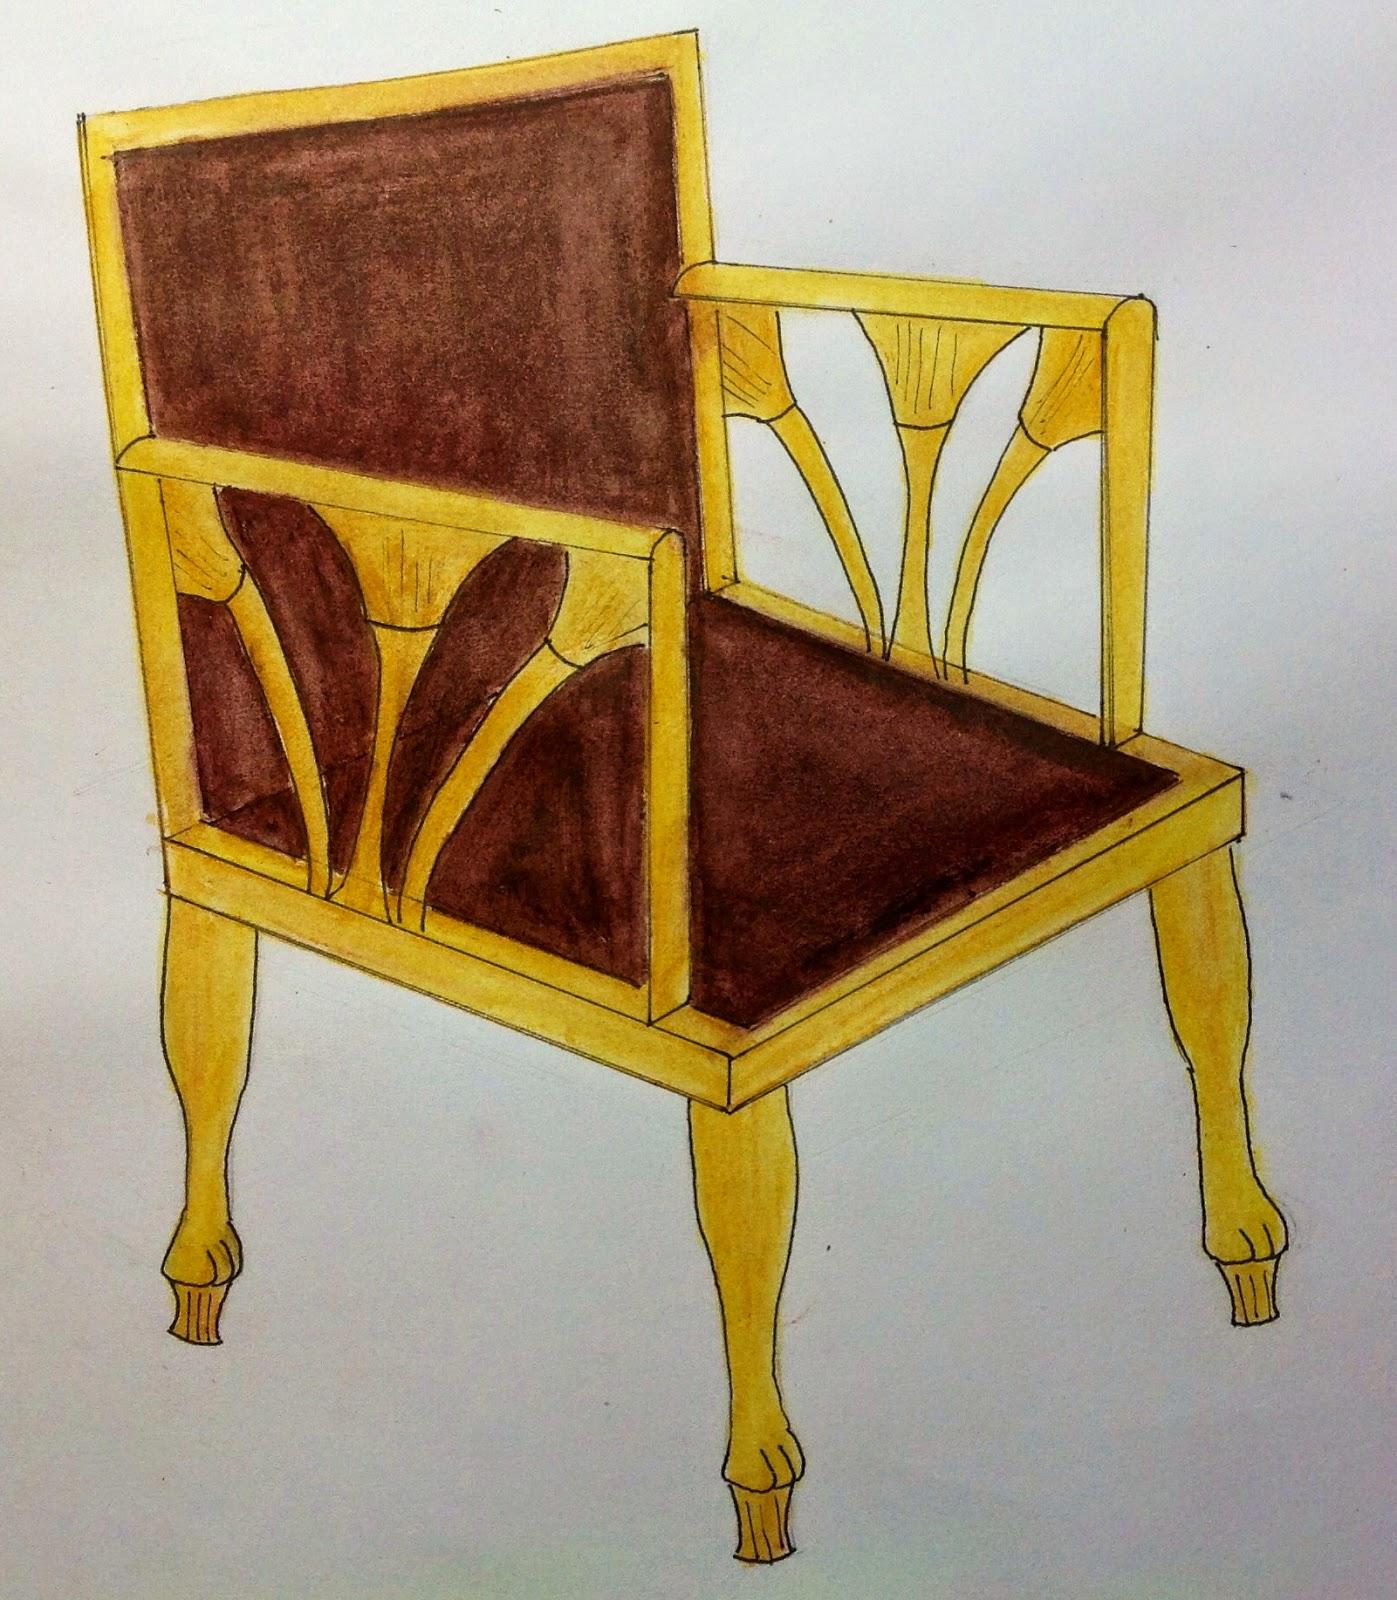 historia con gloria muebles egipcios